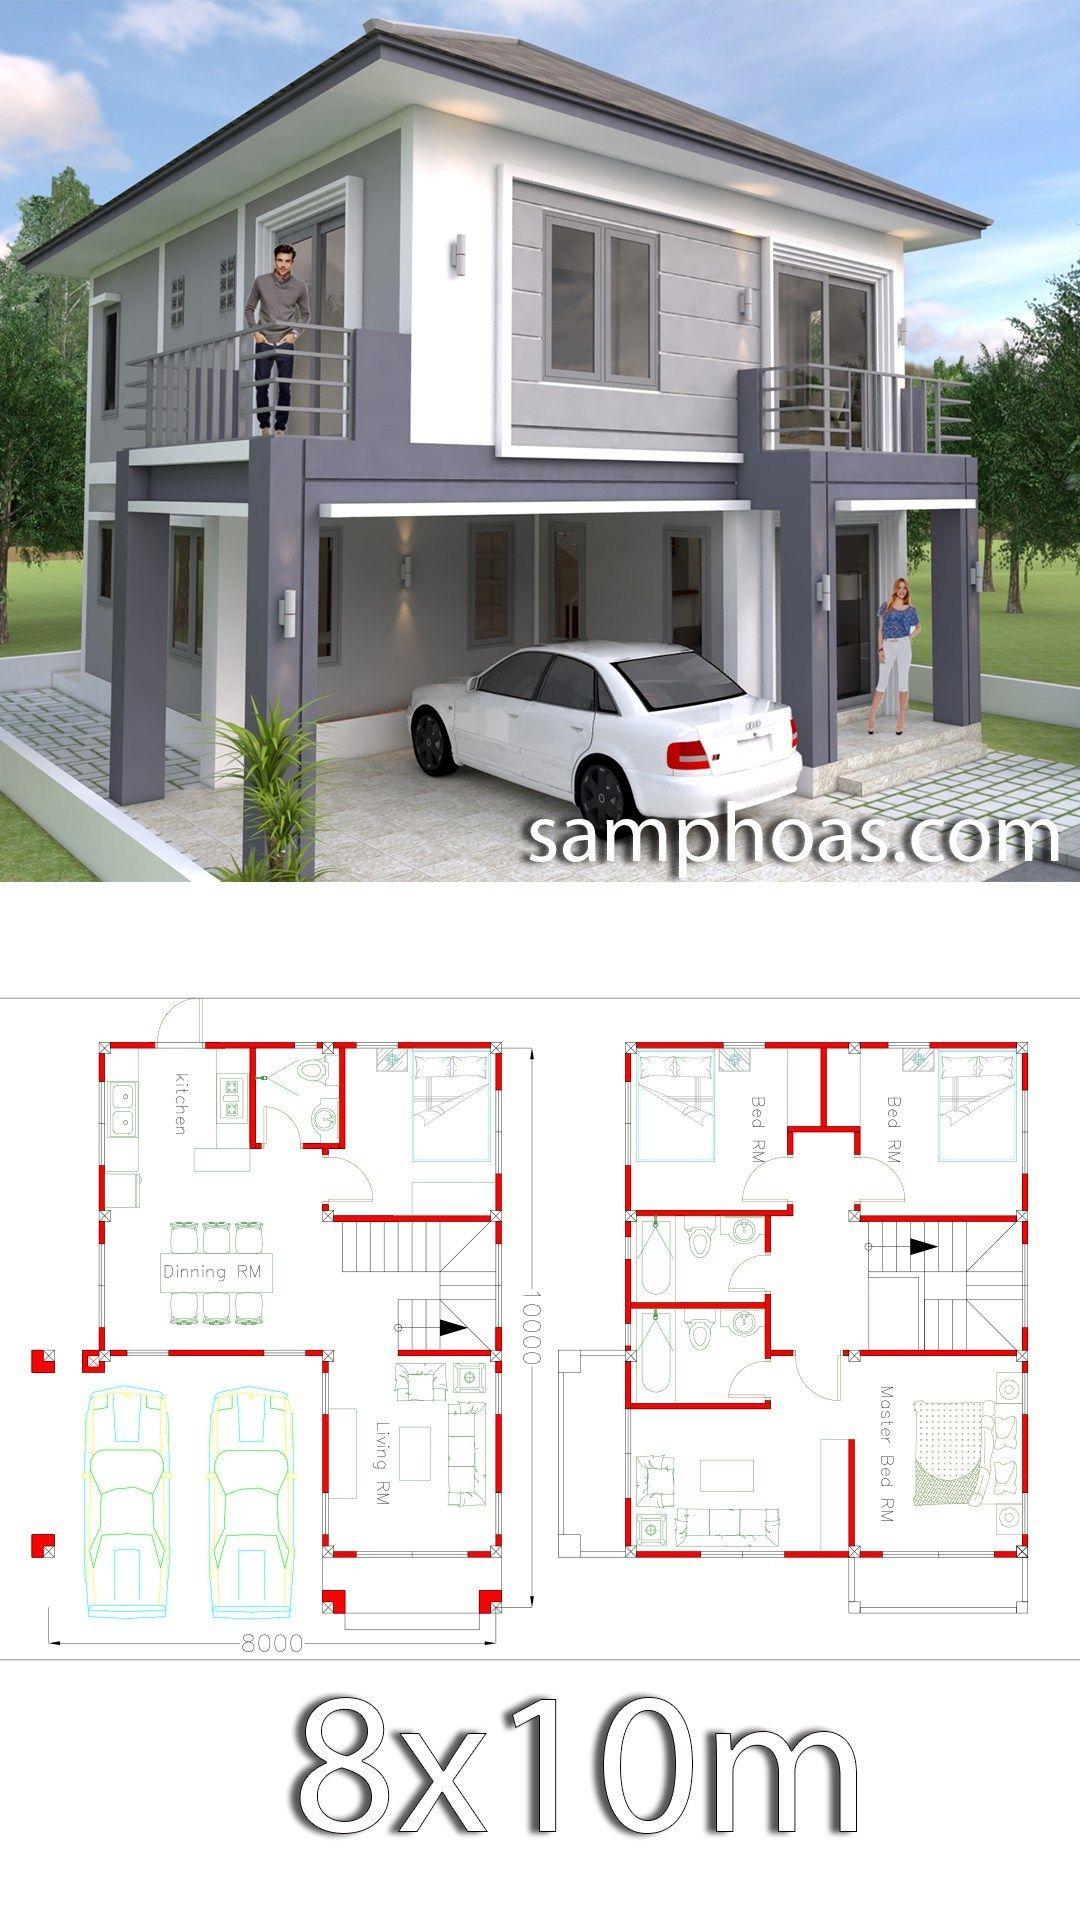 4 Bedrooms Home Design Plan 8x10m Planos De Casas Medidas